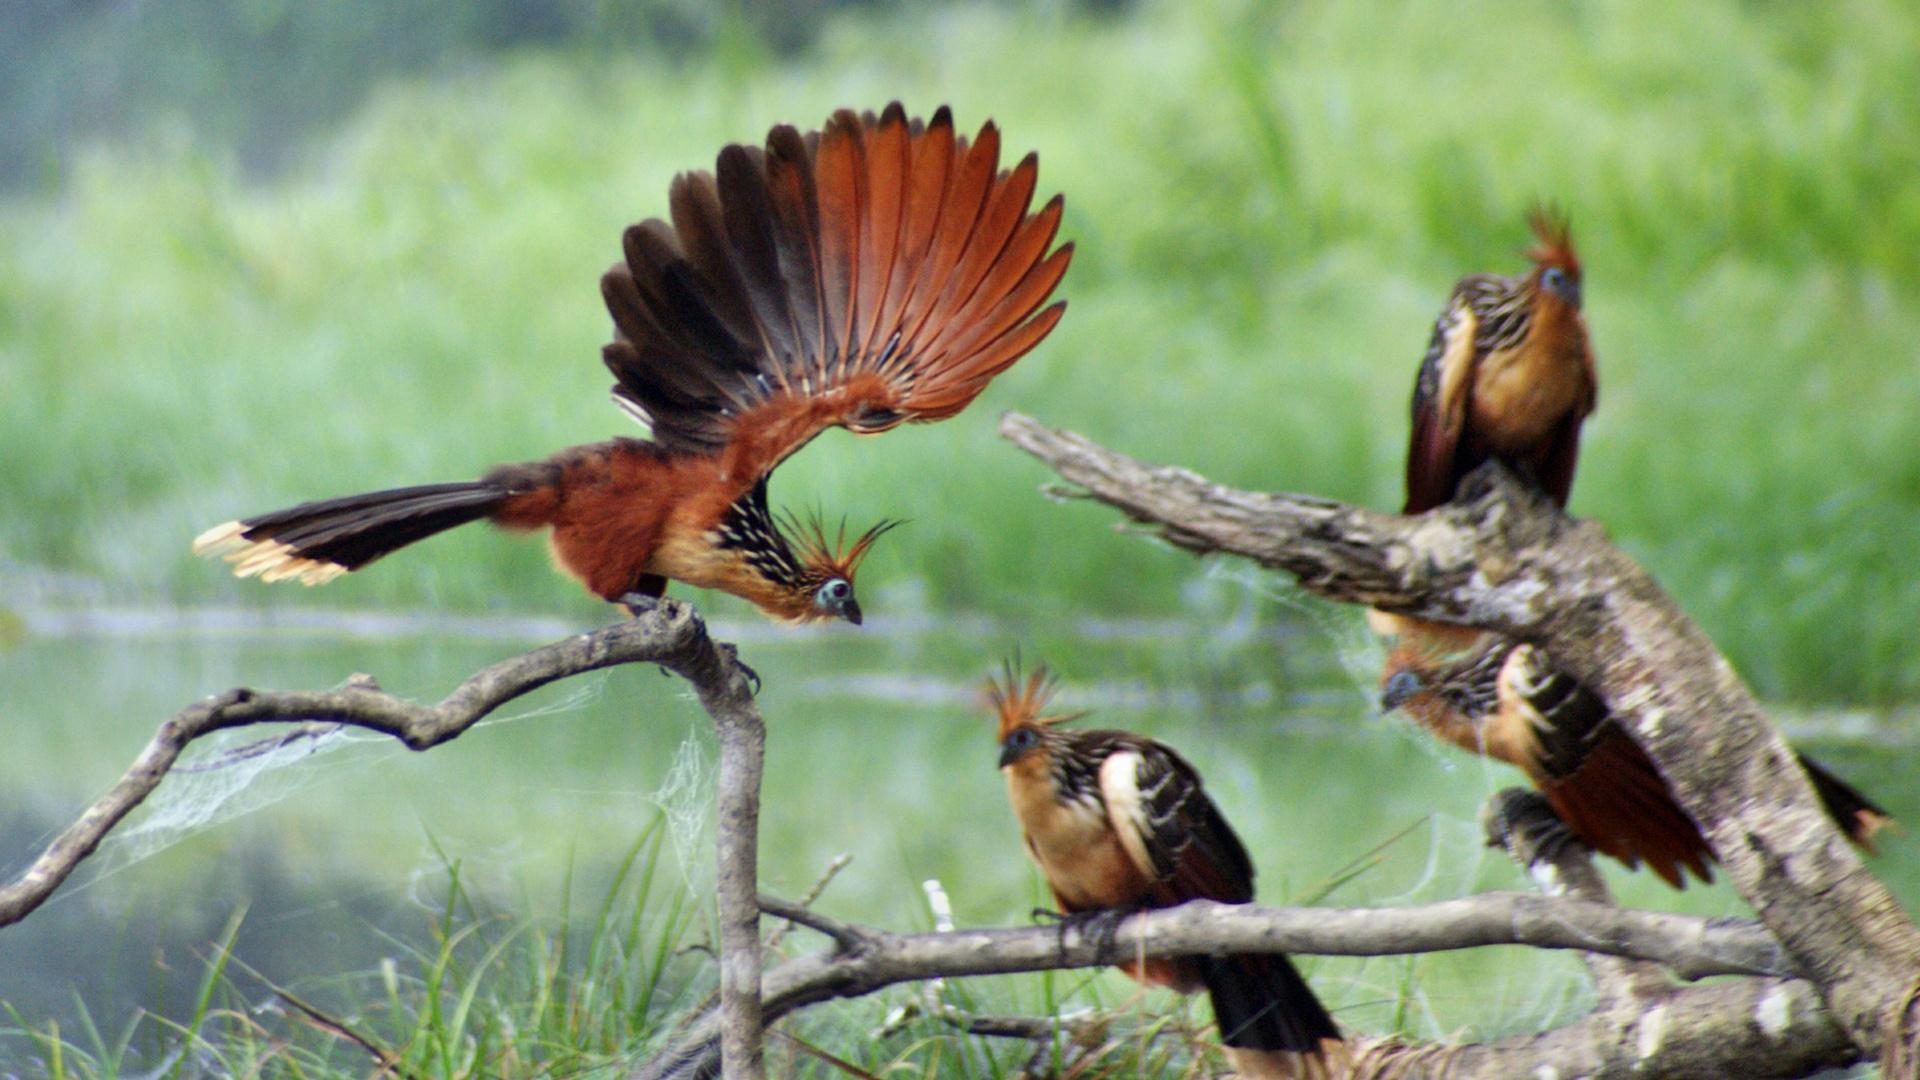 Hoatin-Stinkvögel